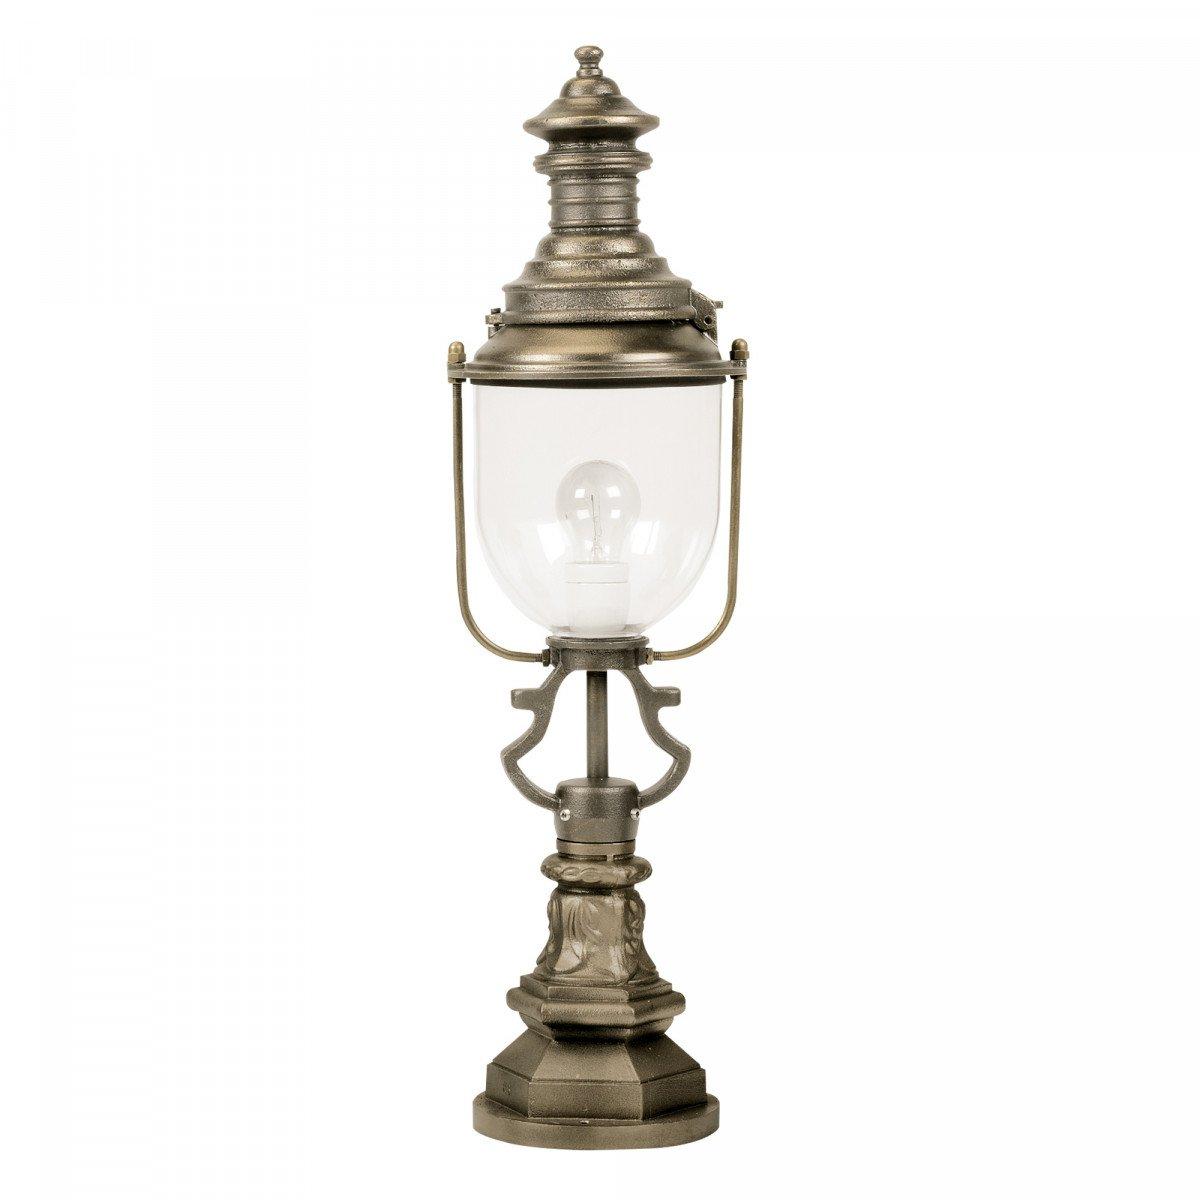 Historische Klassischen Bronze  Außenlampe